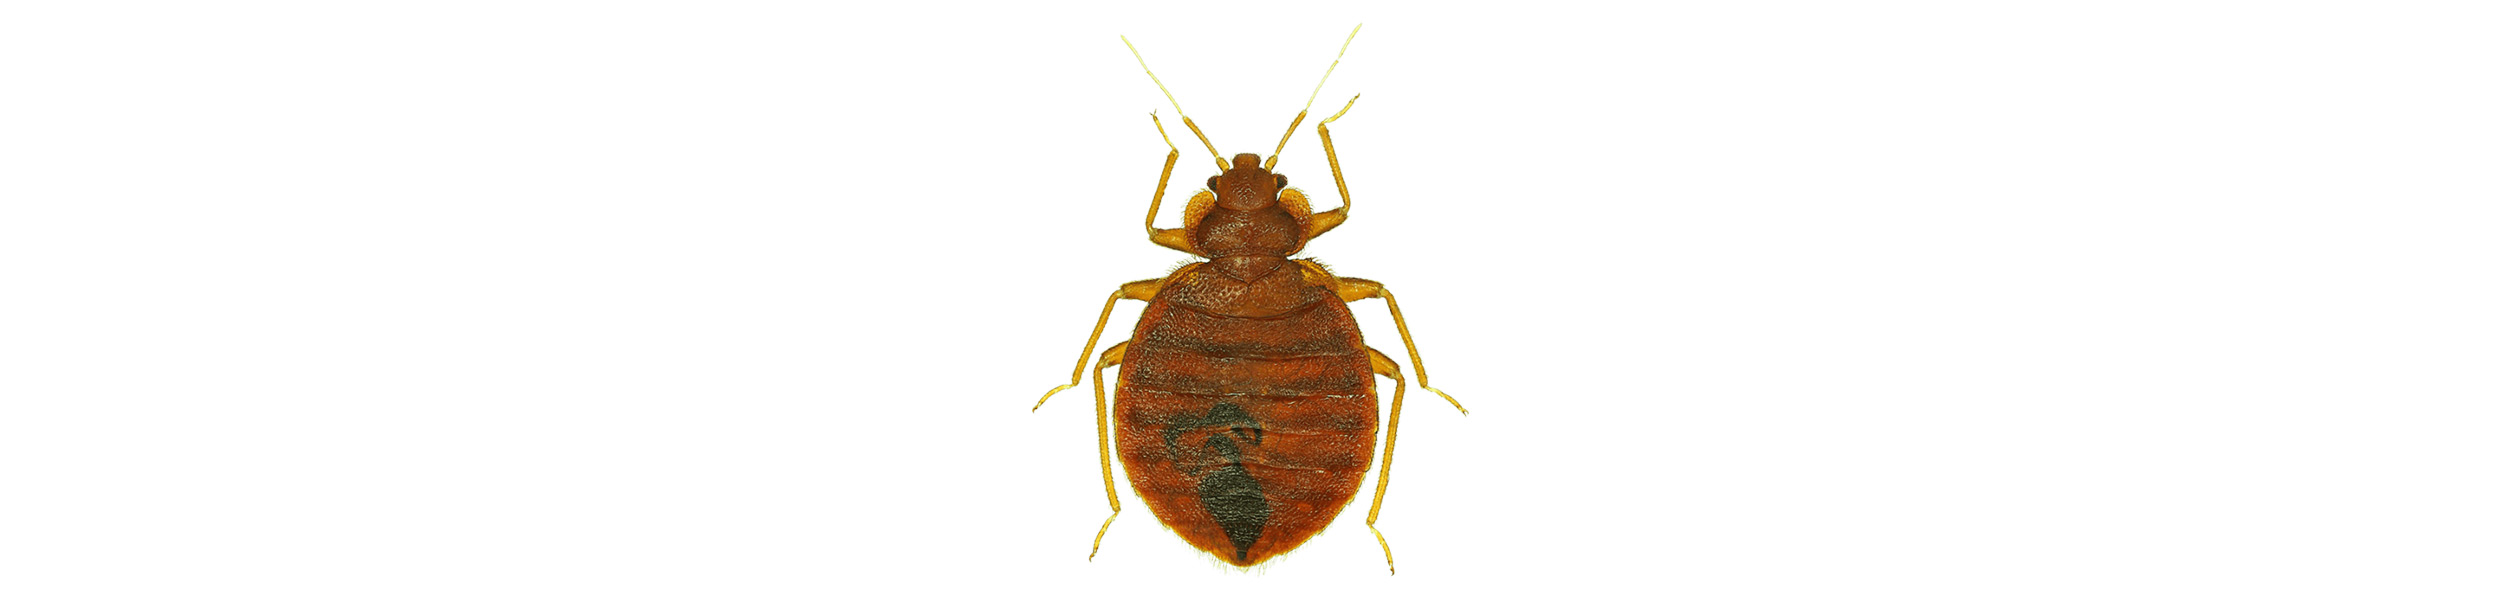 ACE Exterminating-Pest-Control-Bed-Bug-Header